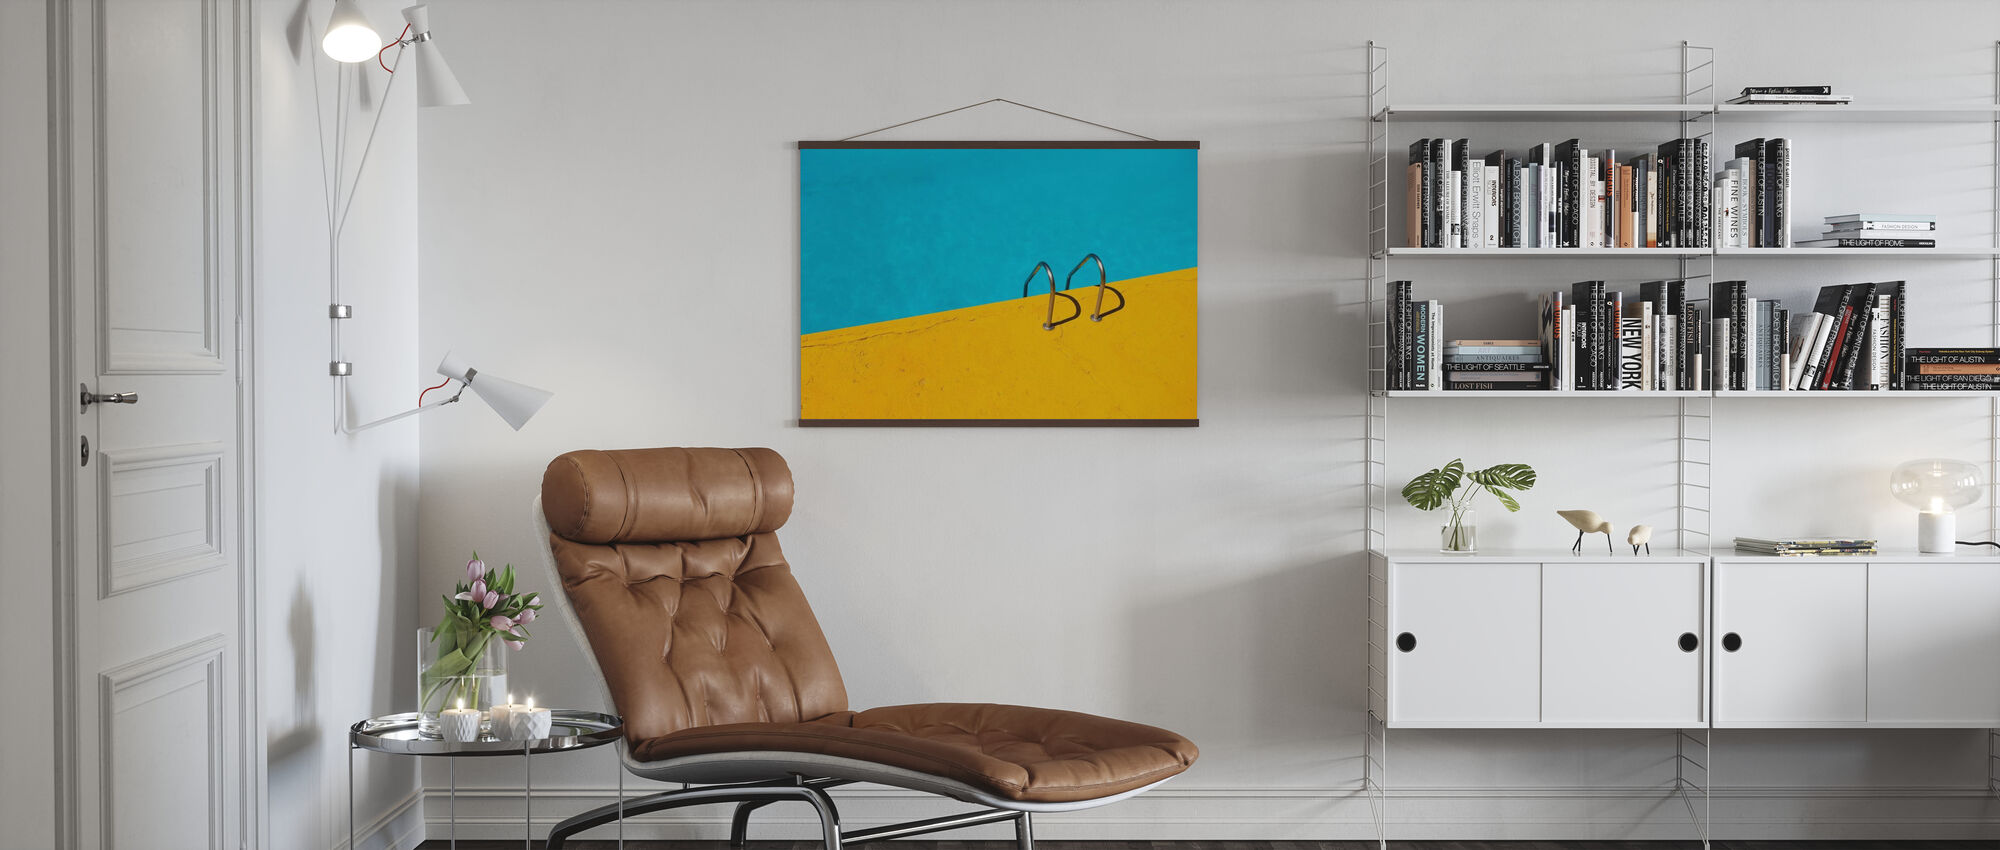 Swimming Pool Handrail - Poster - Living Room